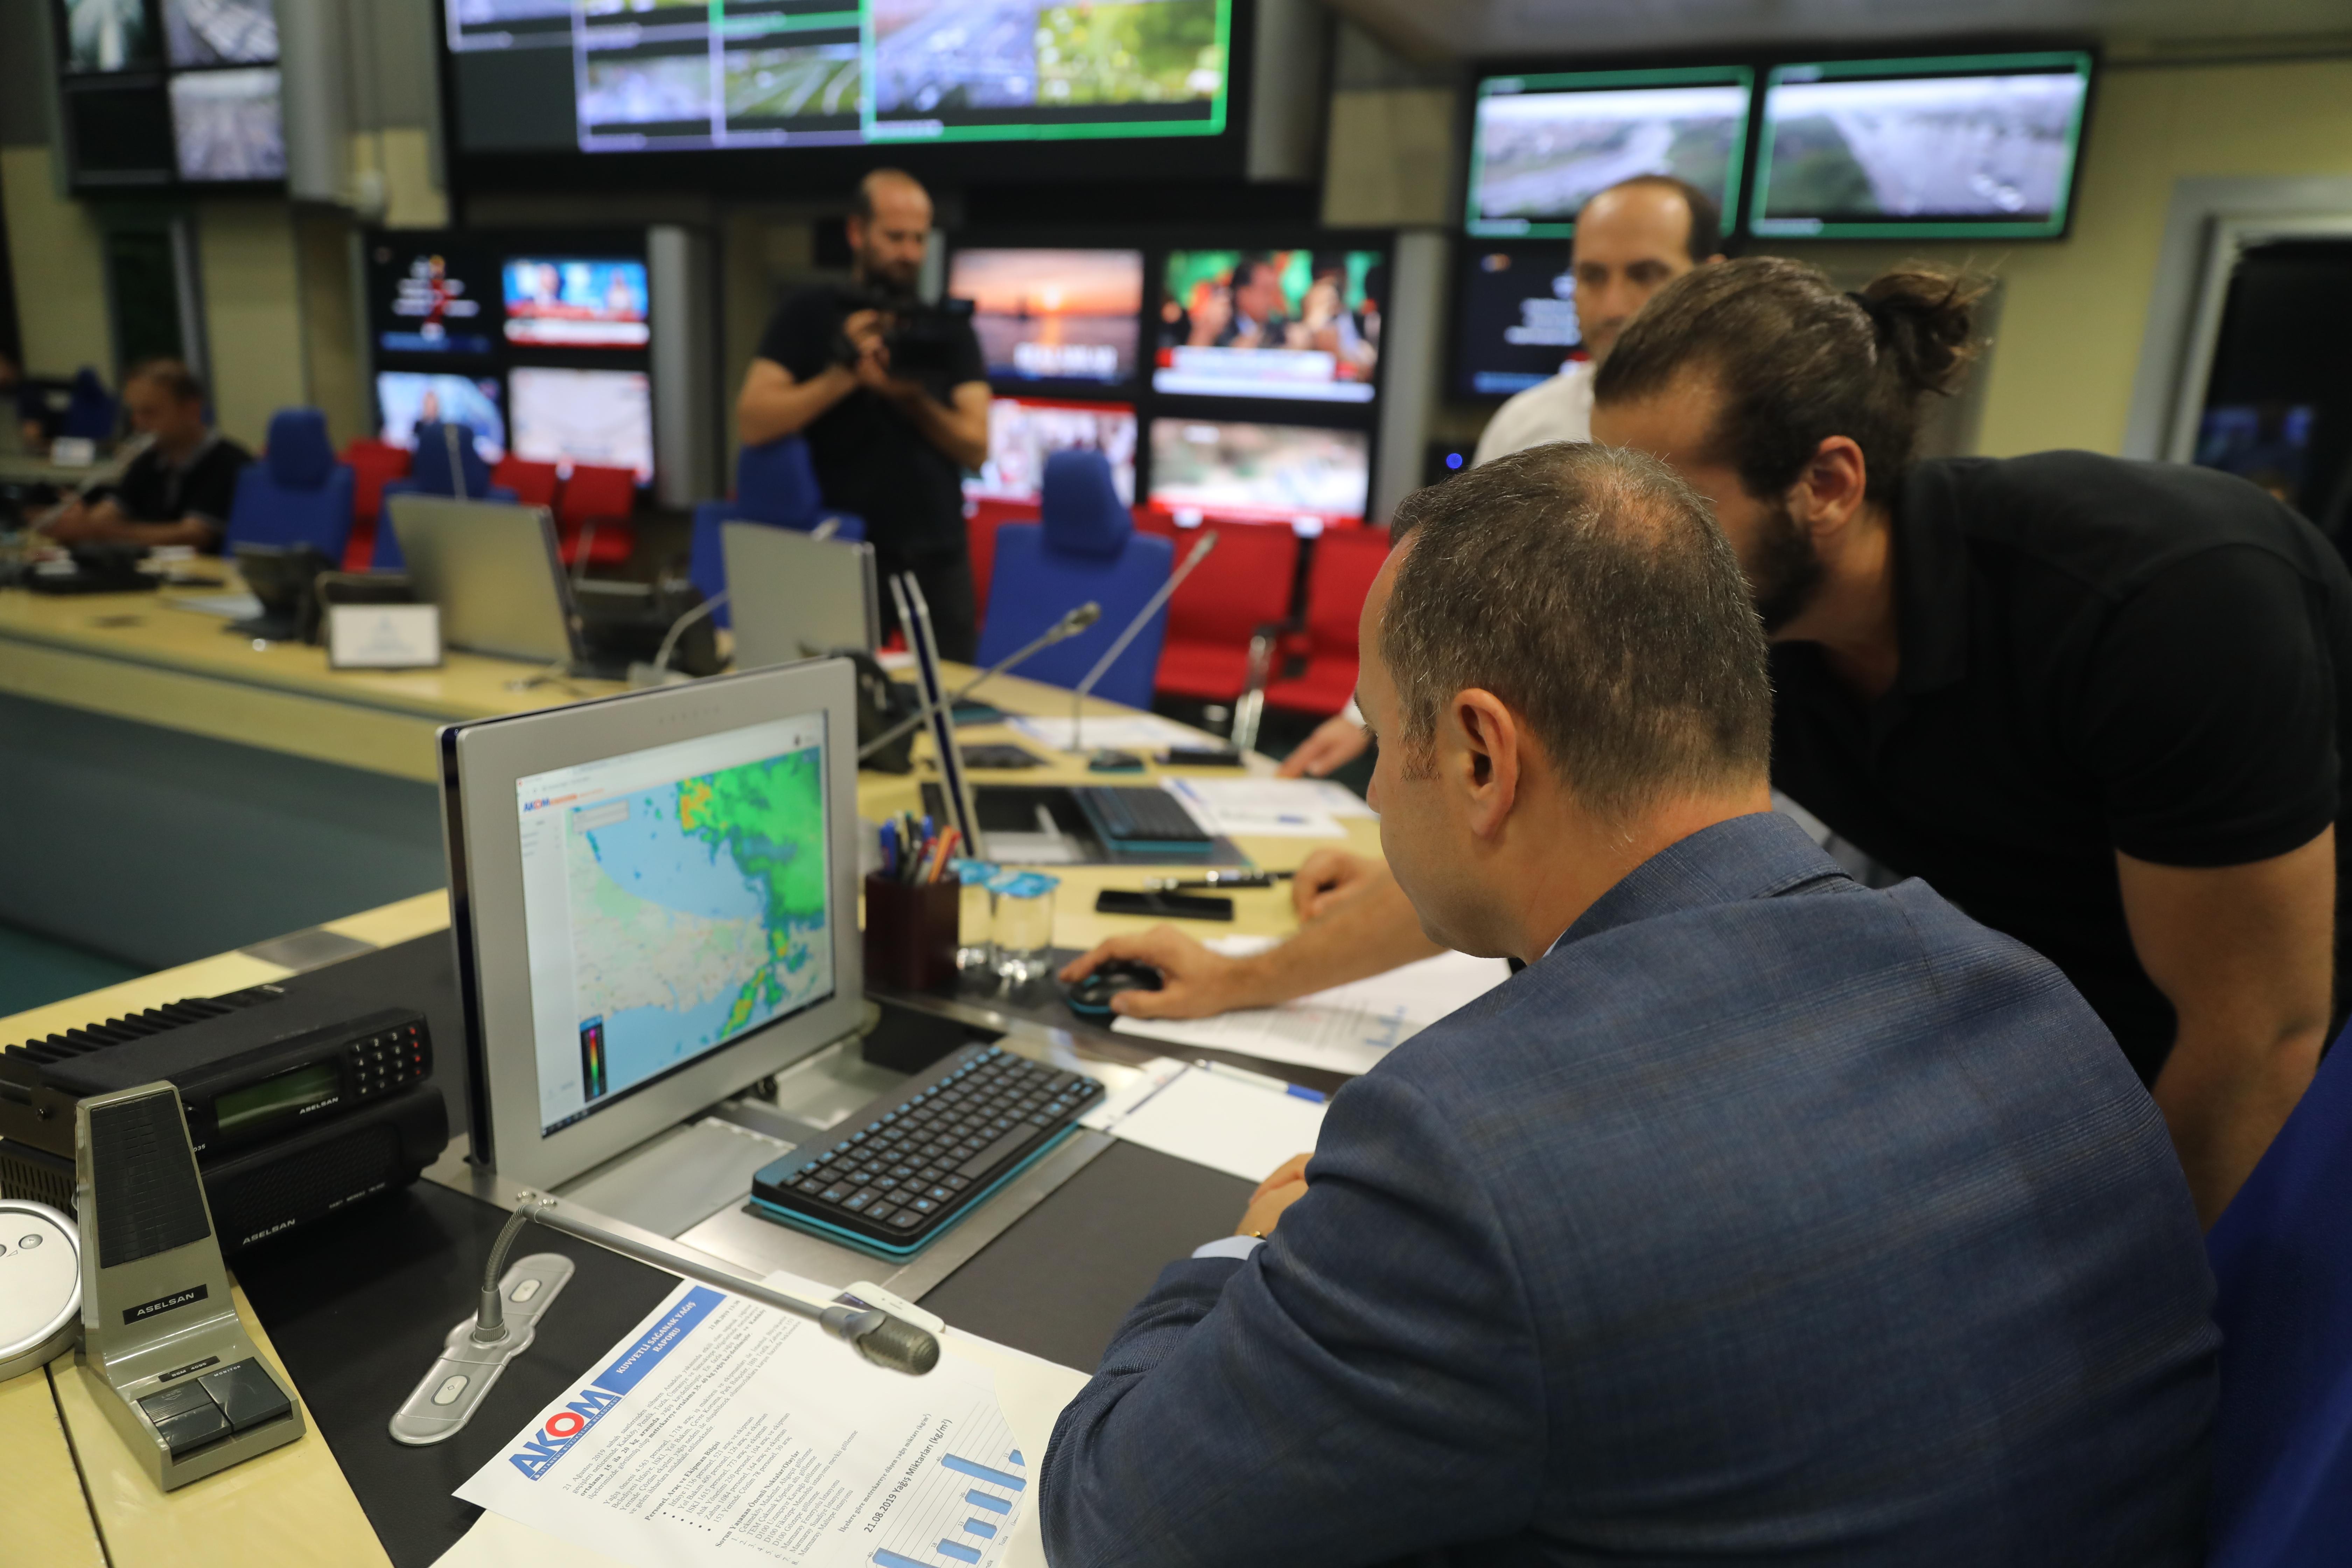 Murat Yazıcı: We monitor Istanbul 24/7 from AKOM - News - Istanbul Fire Department